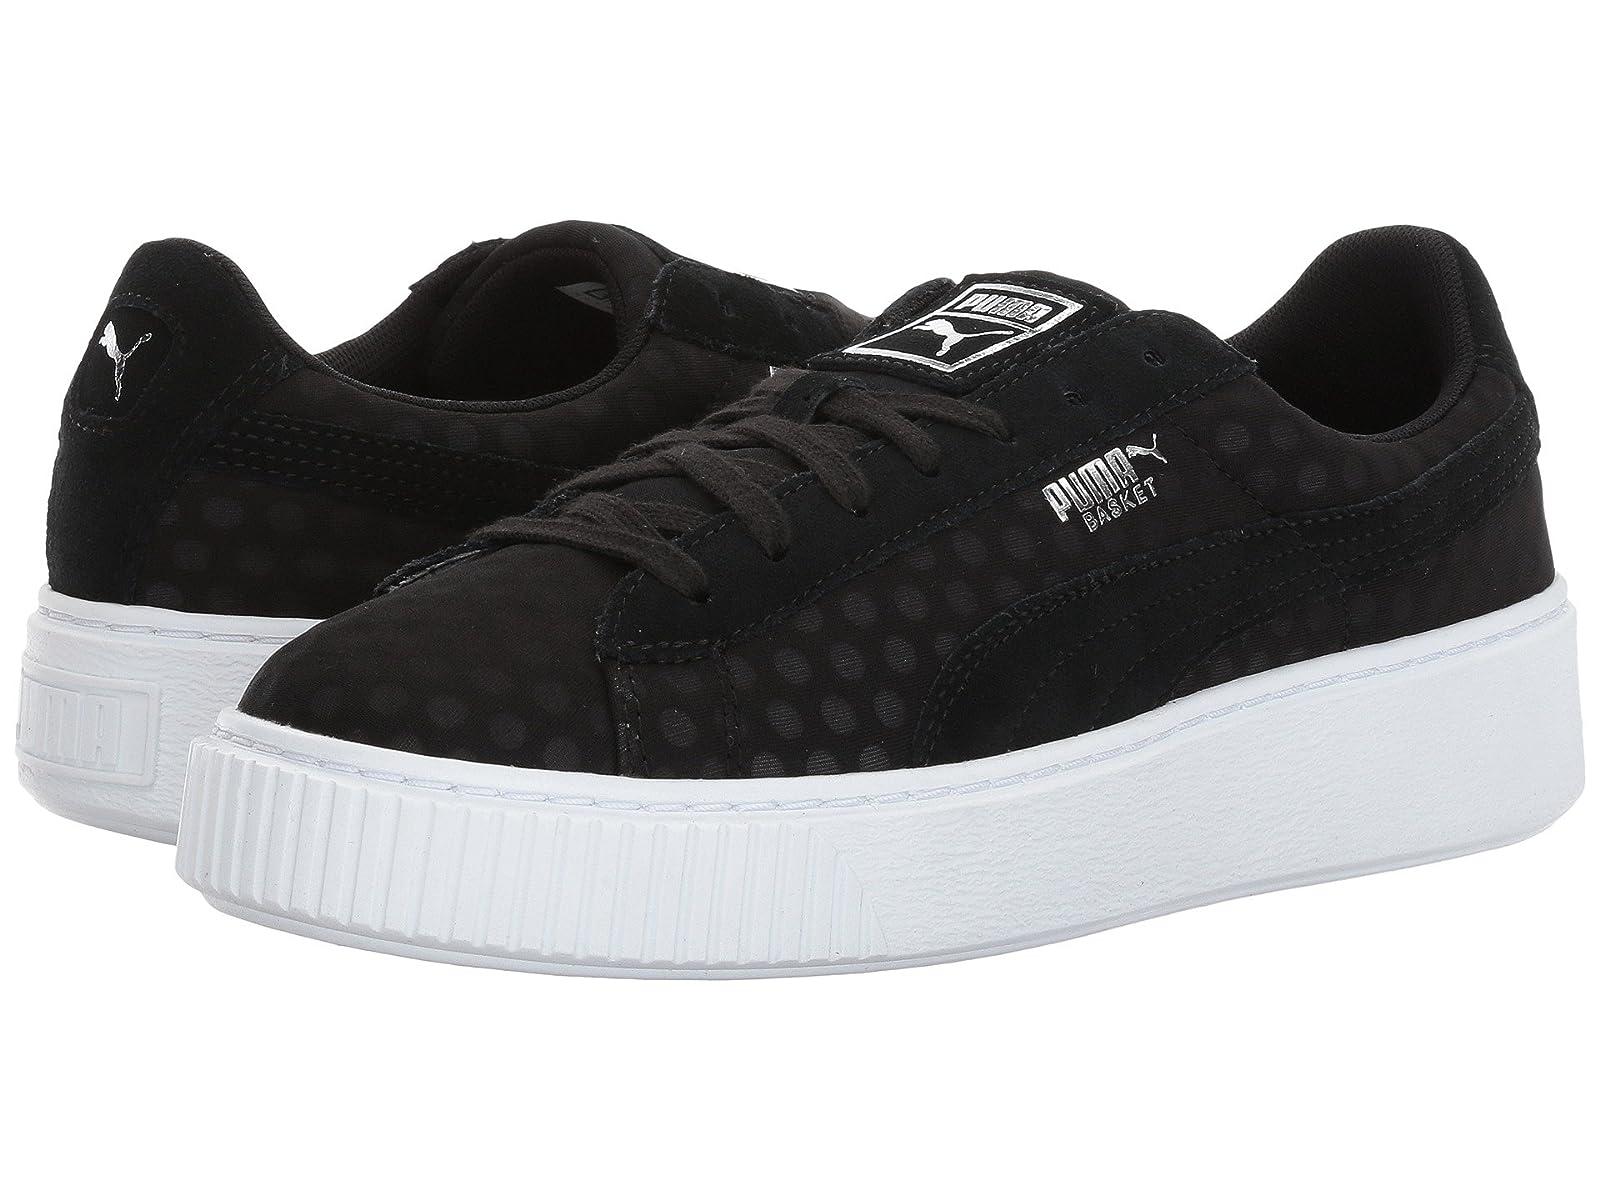 PUMA Basket Platform DenimCheap and distinctive eye-catching shoes